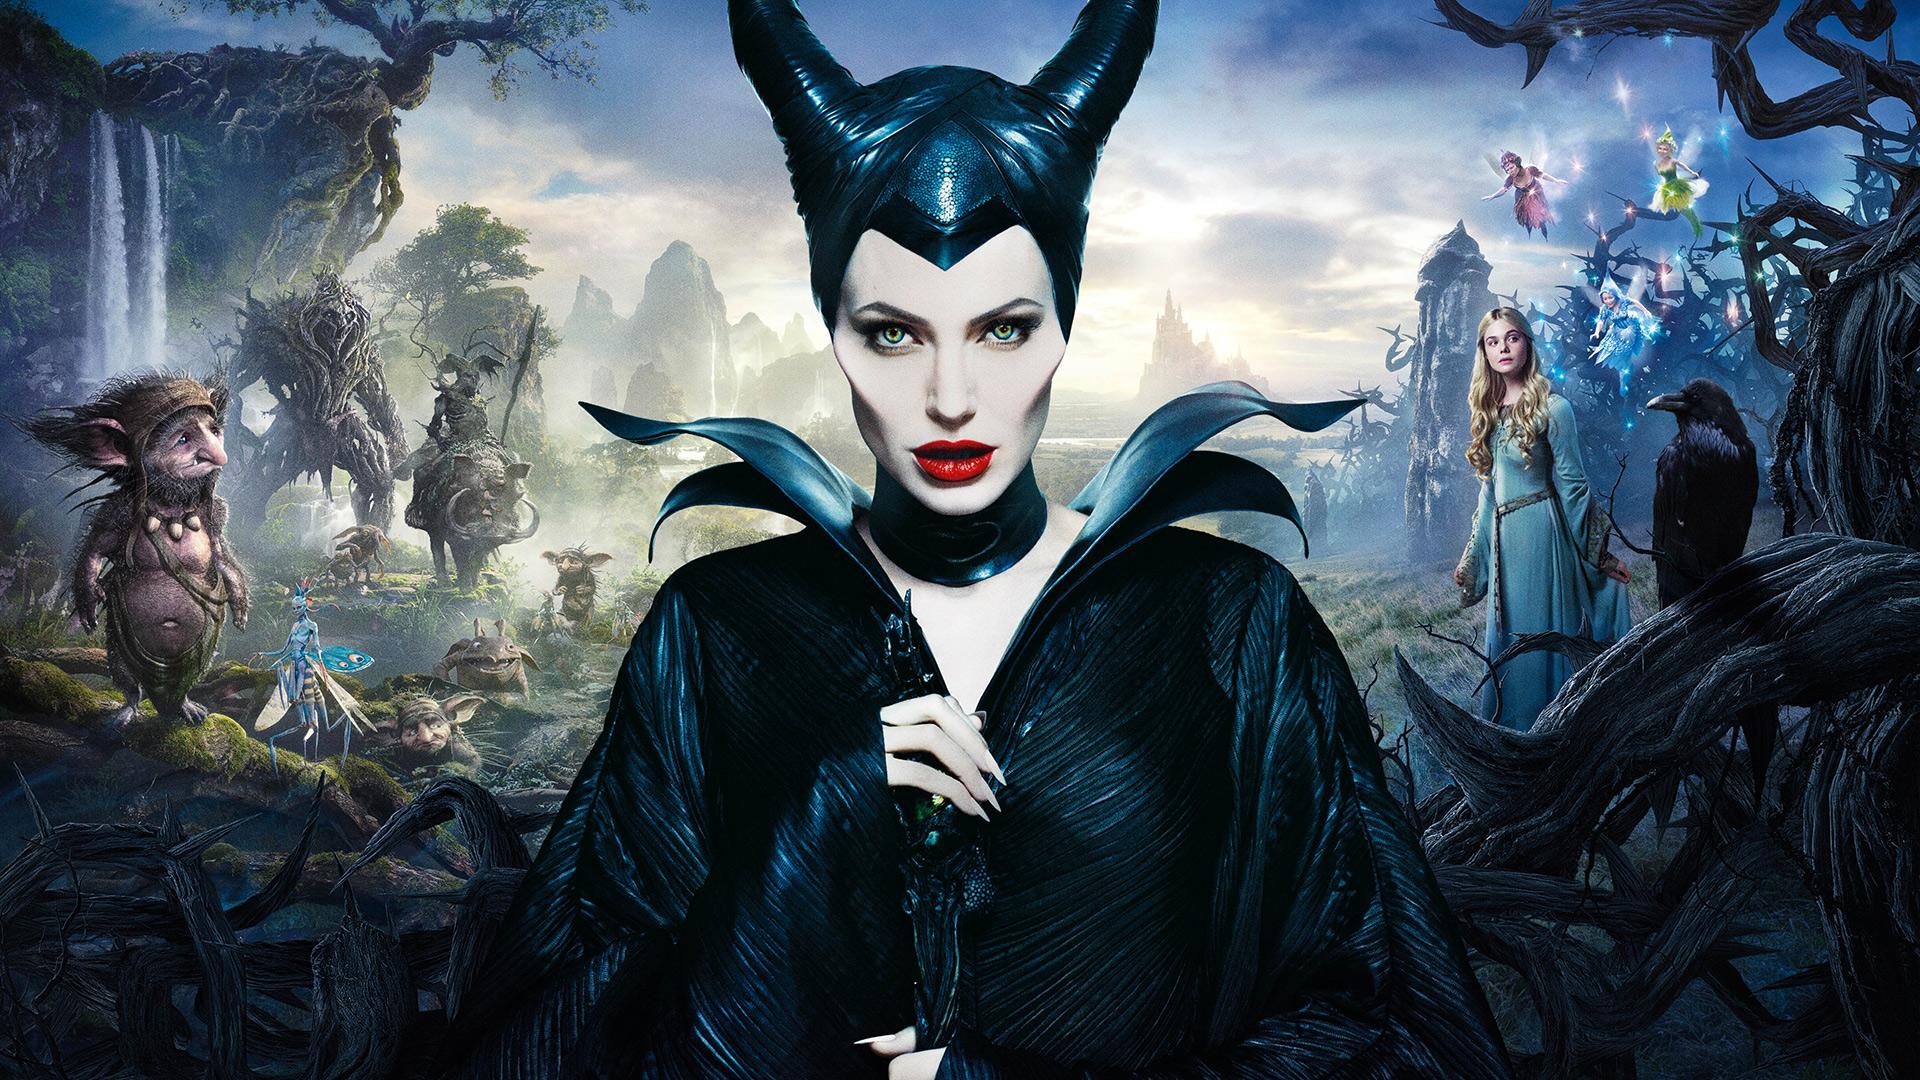 Maleficent wallpaper 5